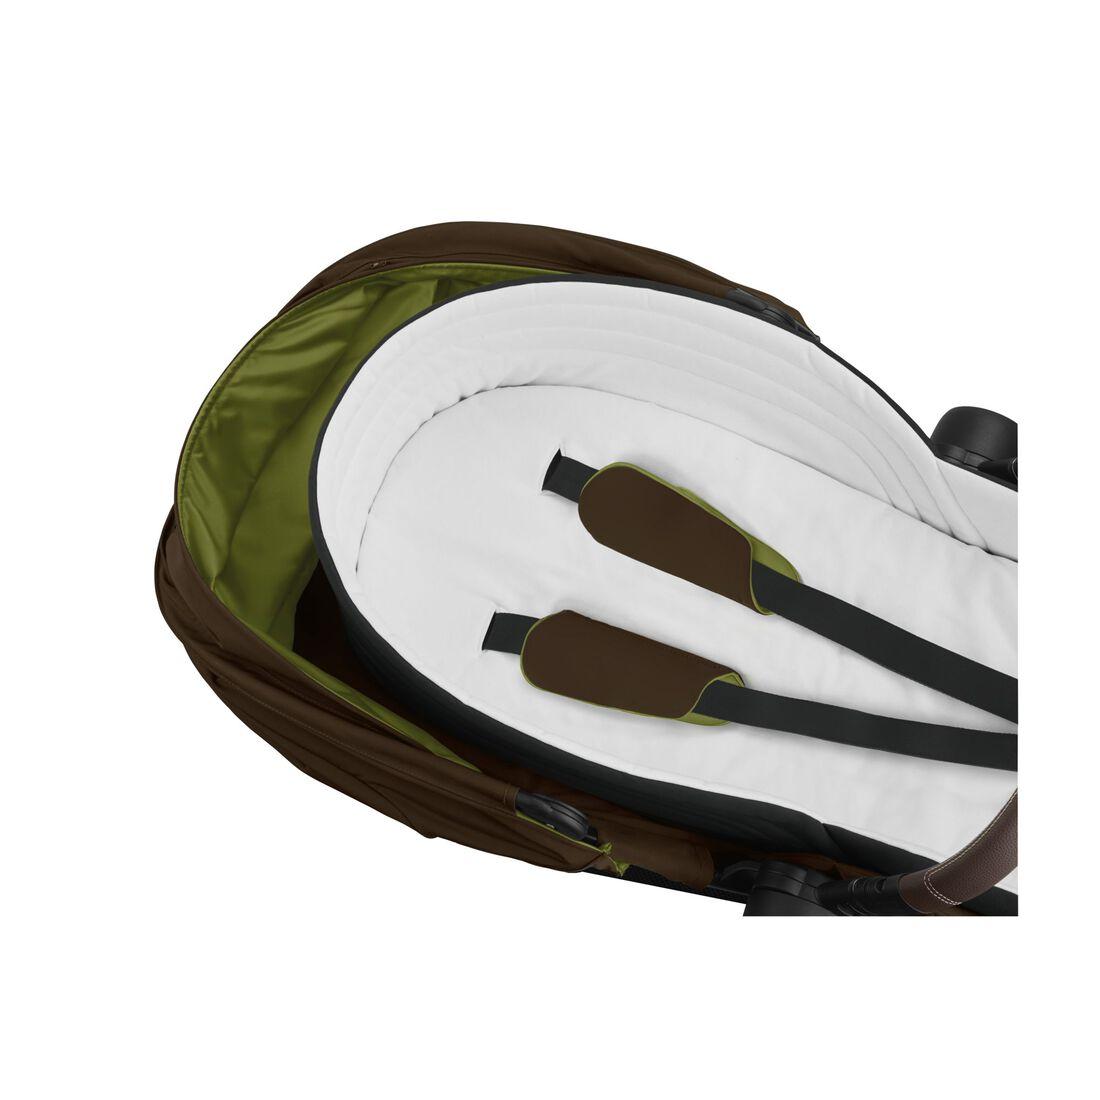 CYBEX Lite Cot - Khaki Green in Khaki Green large Bild 2